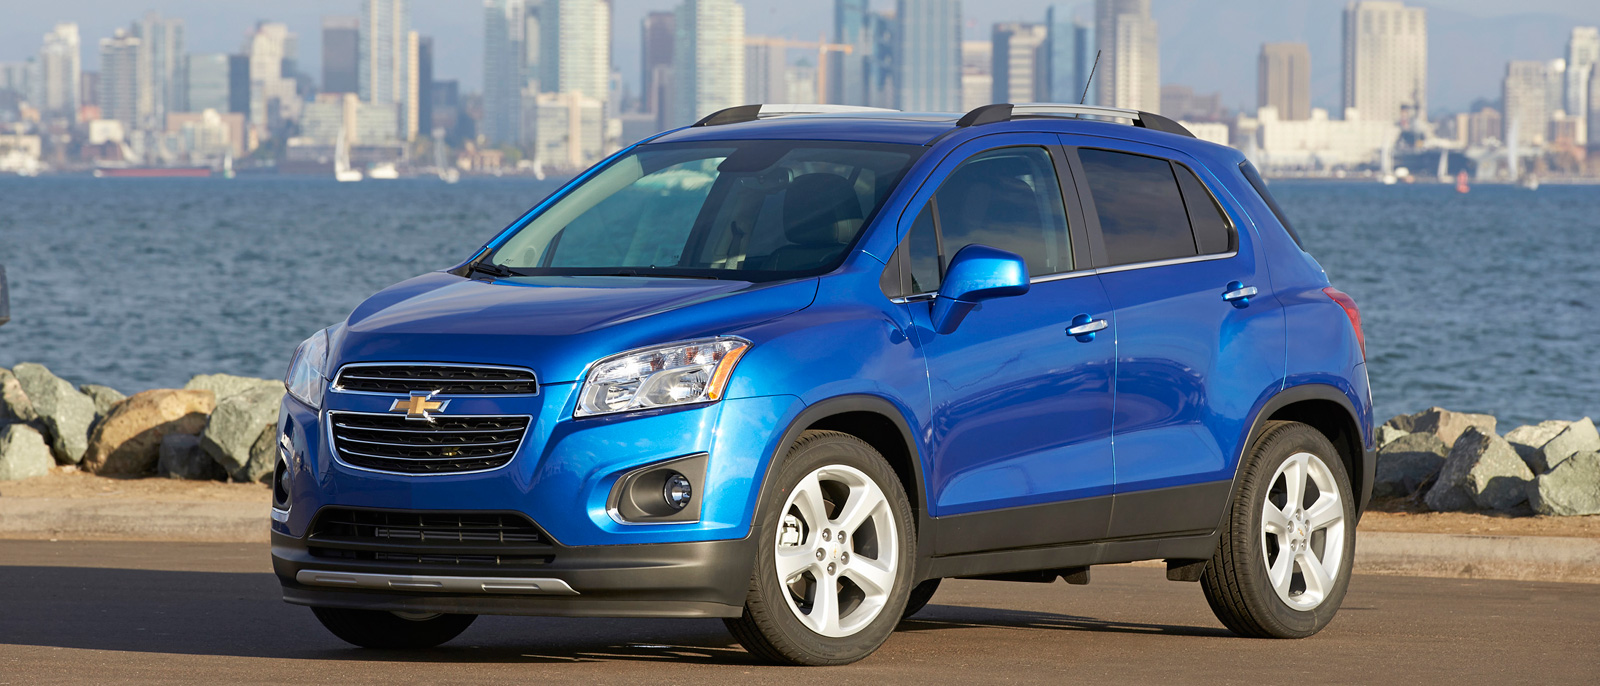 2016 Chevrolet Trax blue exterior